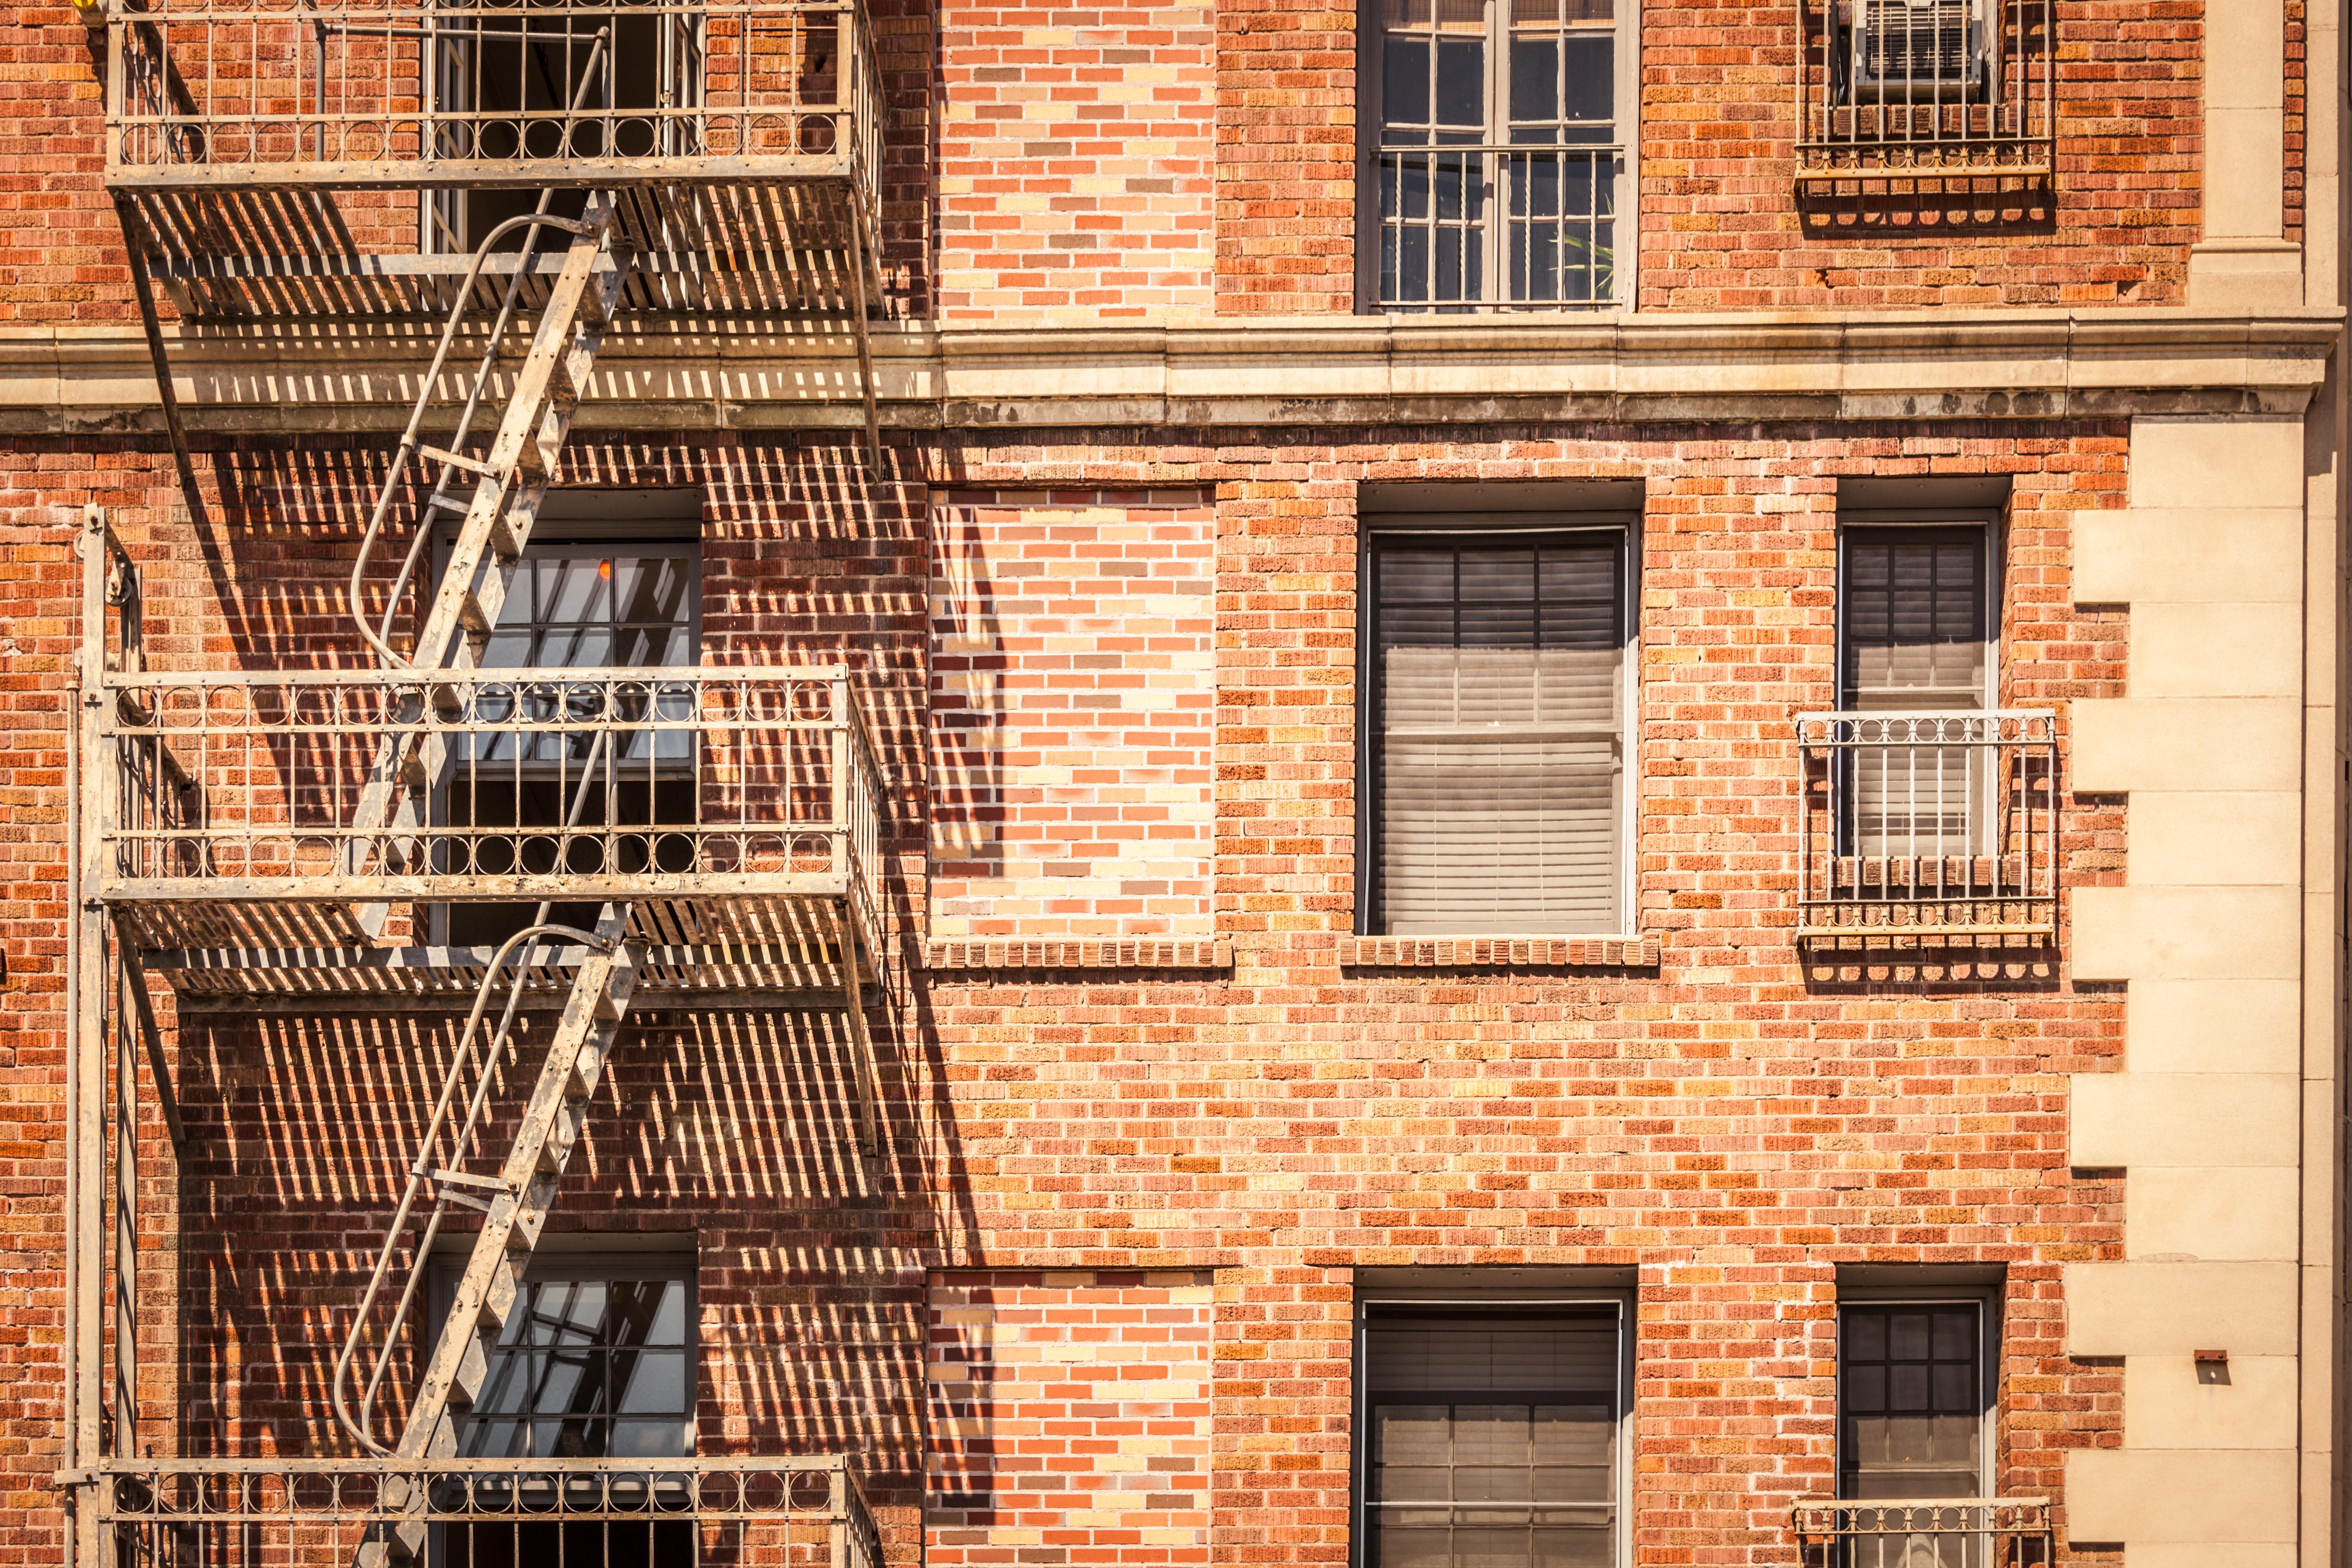 Apartment fire escape